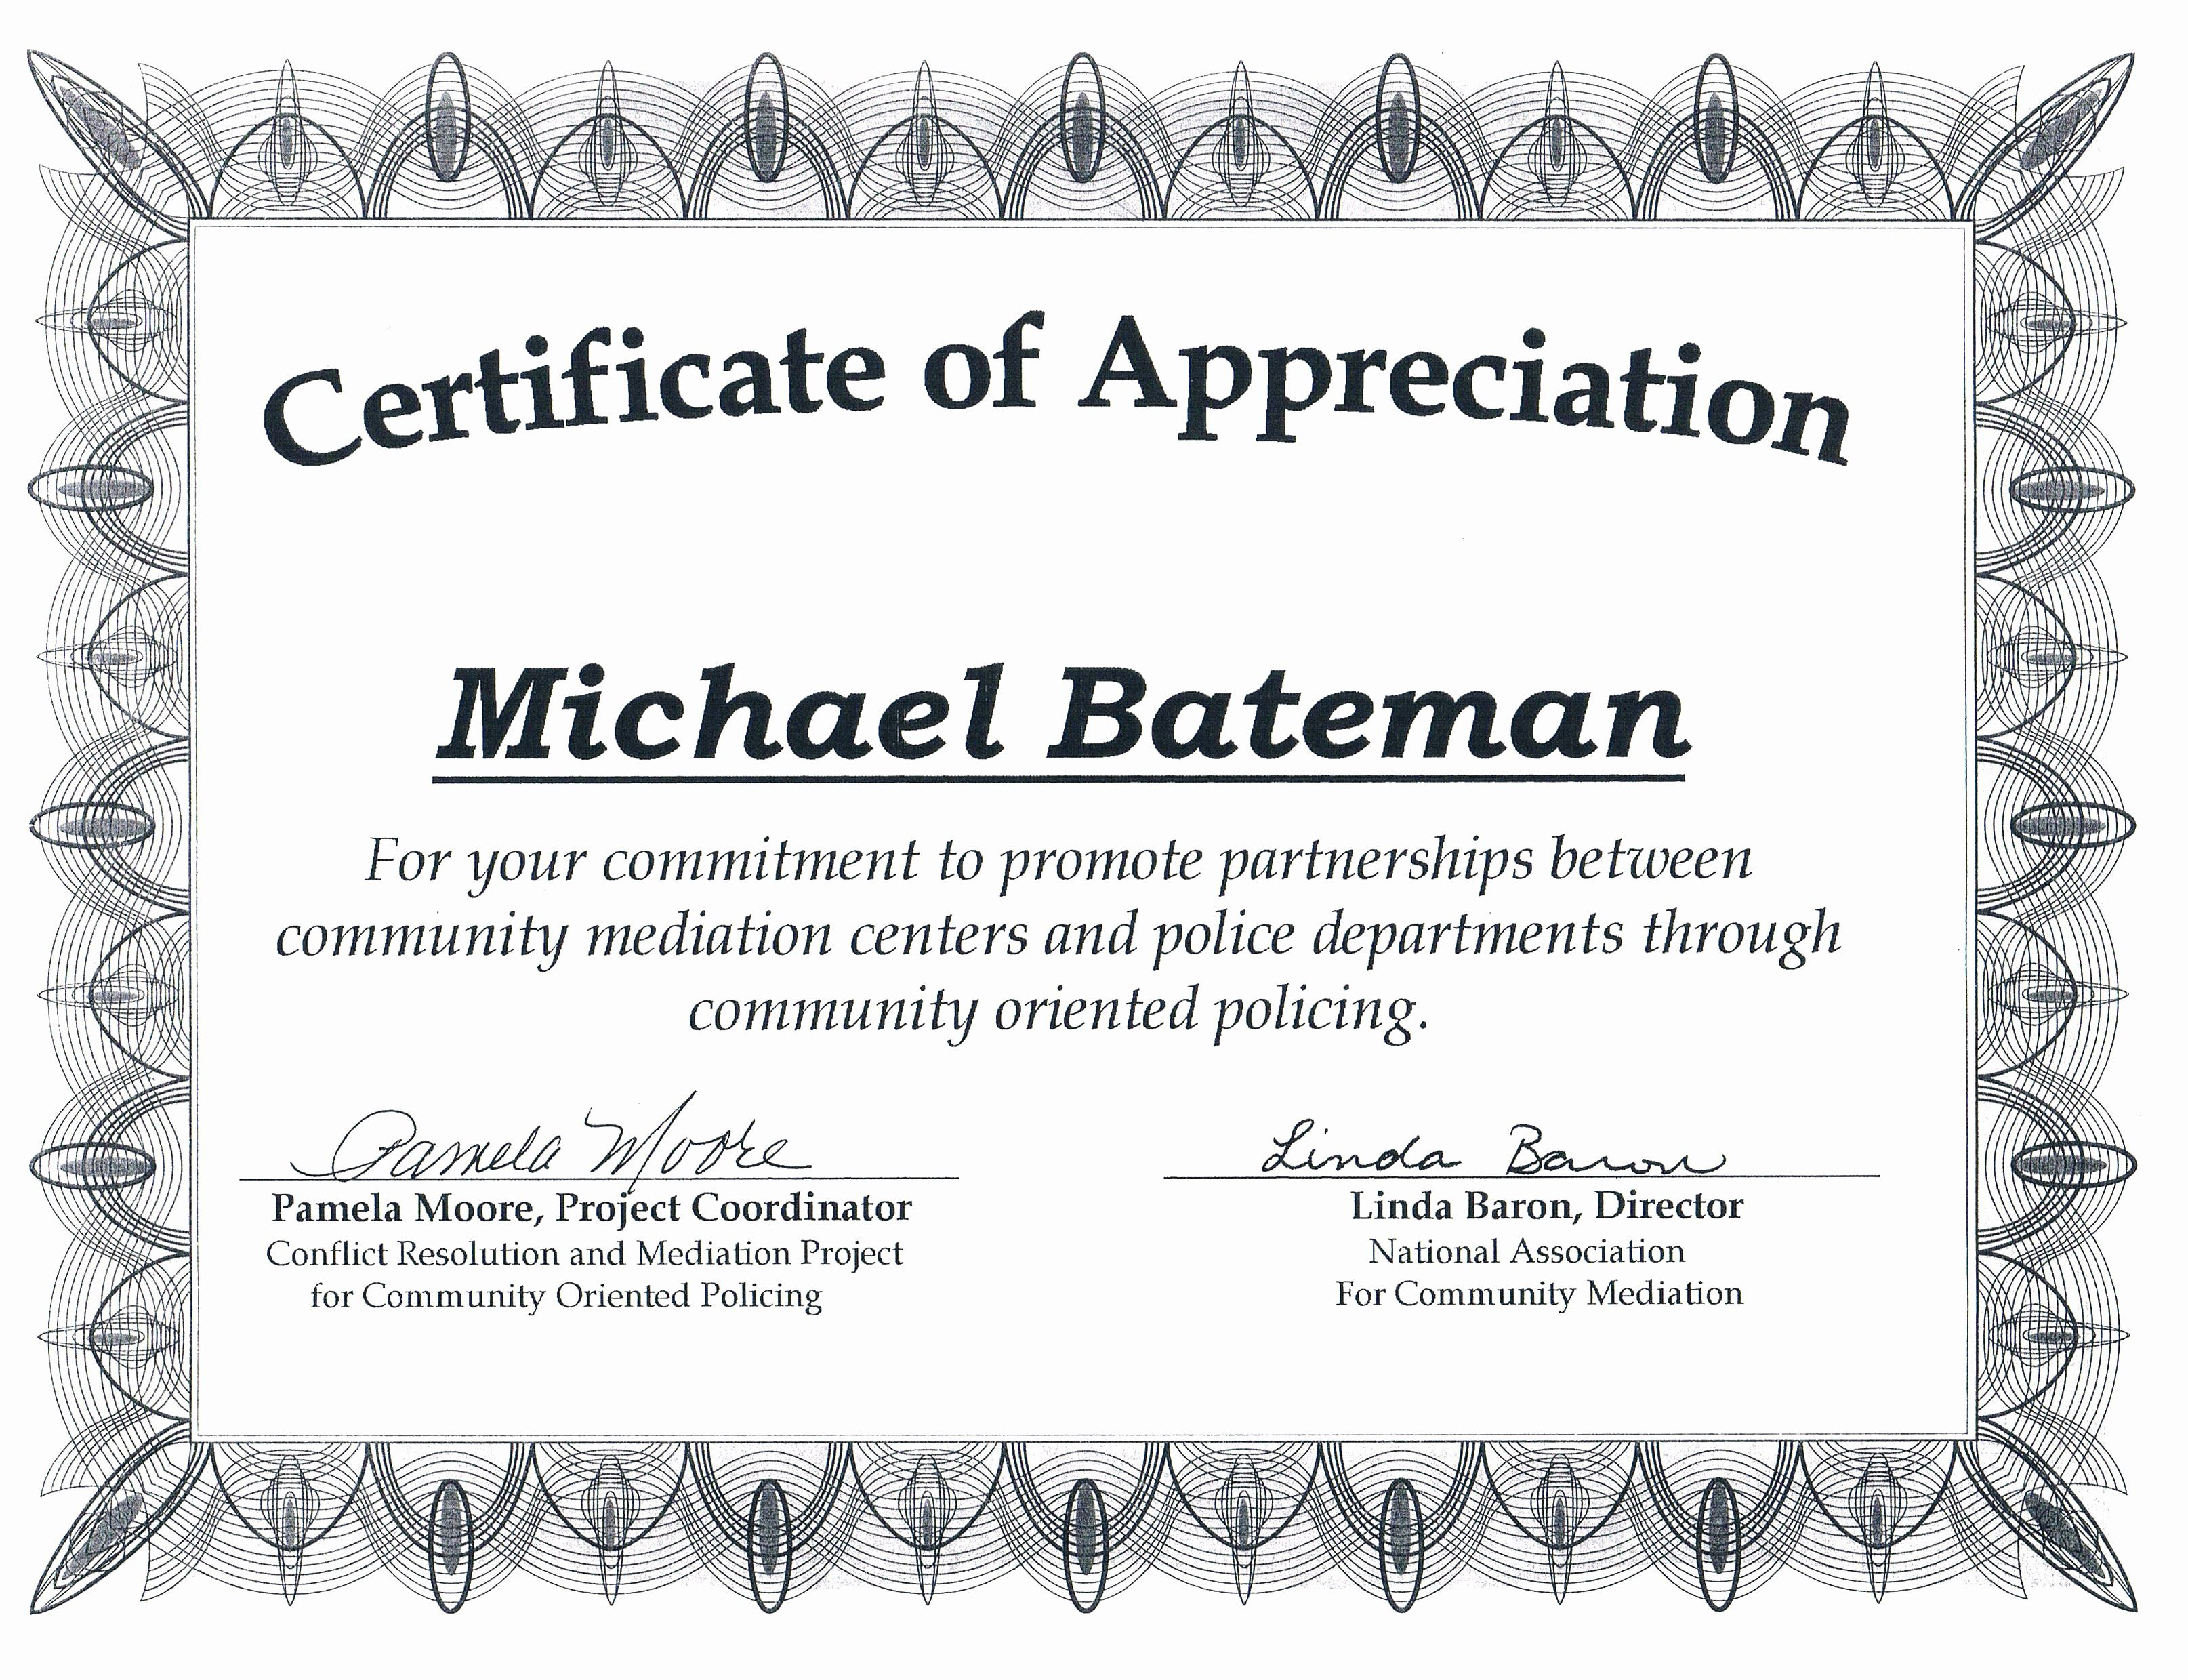 Community service certificate template free luxury munity